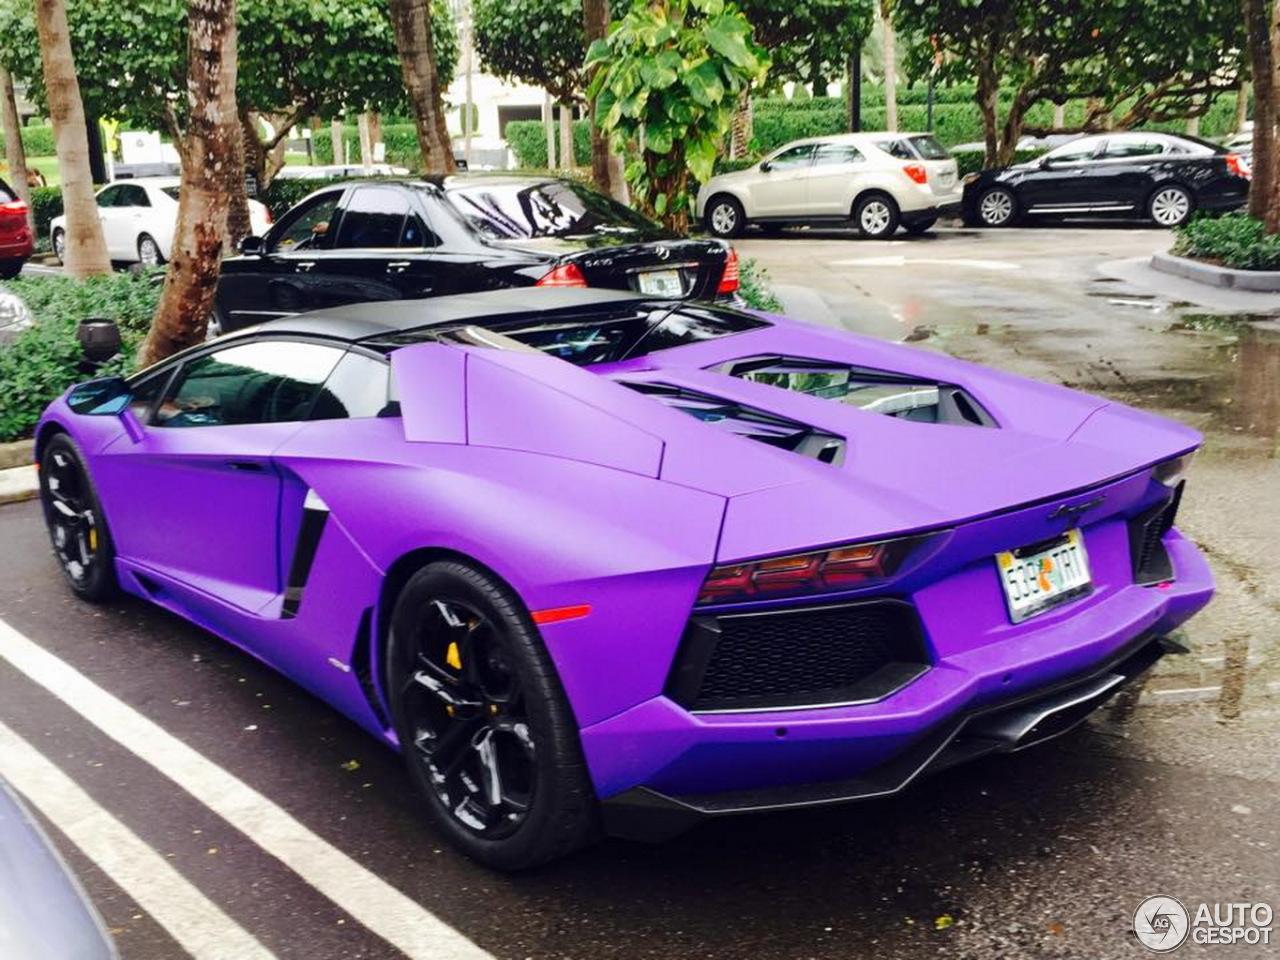 2 i lamborghini aventador lp700 4 roadster 2 - Lamborghini Aventador Chrome Purple